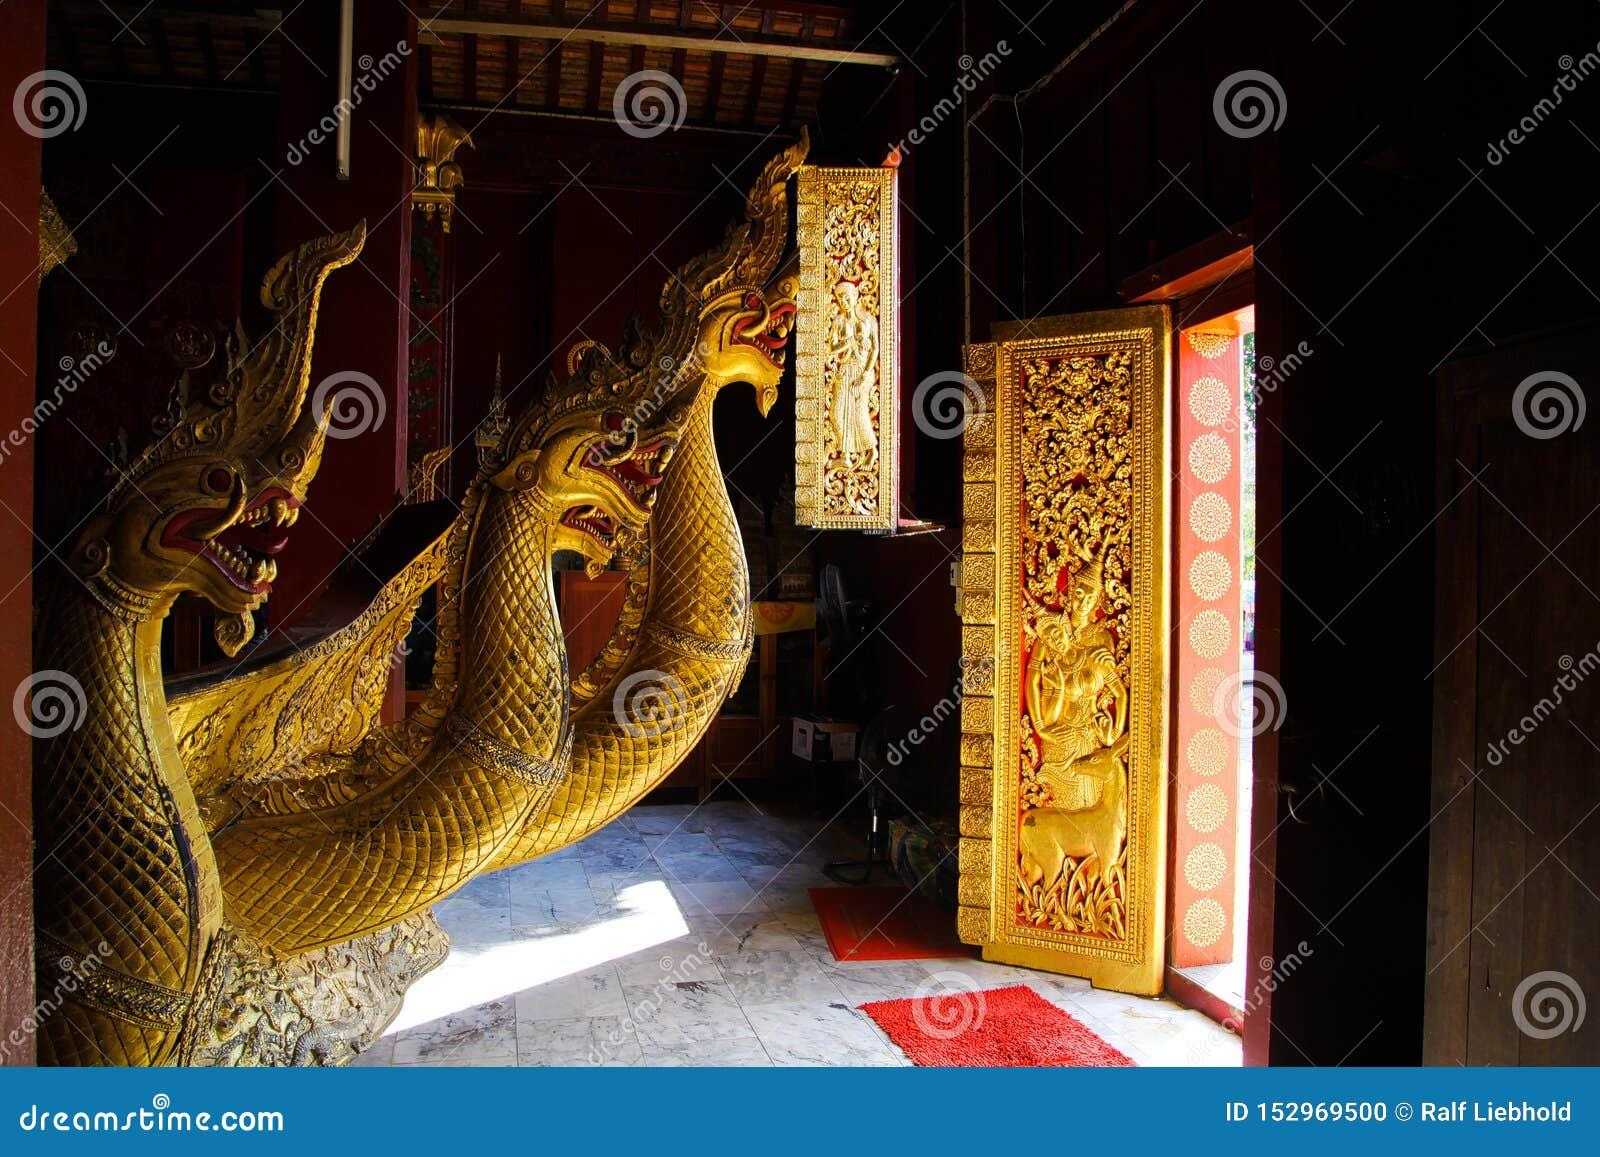 LUANG PRABANG WAT XIENG THONG, LAOS - DECEMBER 17. 2017: Dragon statues inside temple illuminated by natural sunlight